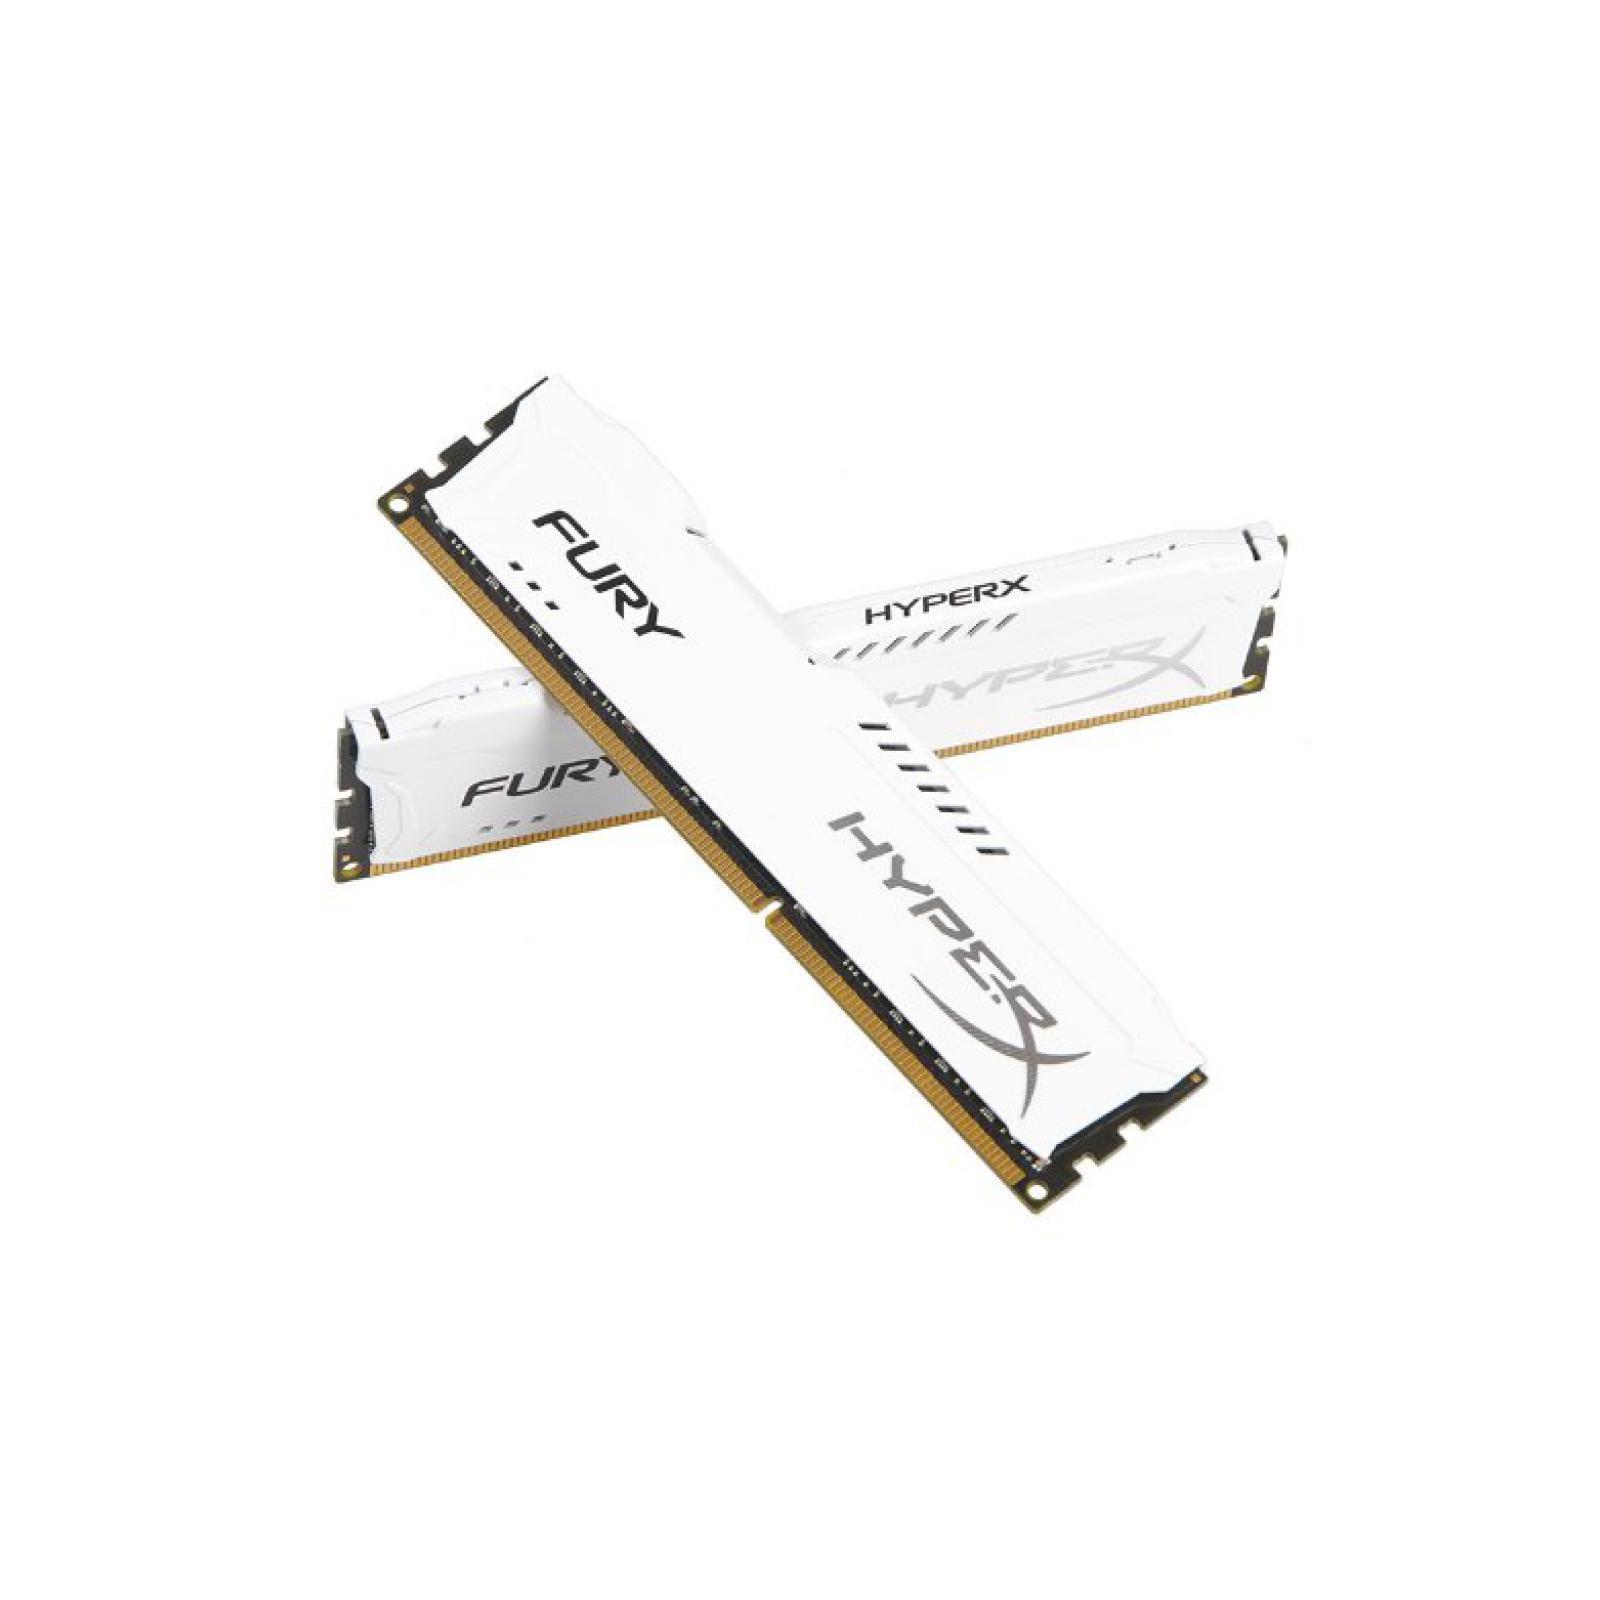 Модуль памяти для компьютера DDR4 32GB (4x8GB) 2933 MHz HyperX FURY White HyperX (Kingston Fury) (HX429C17FW2K4/32) изображение 3